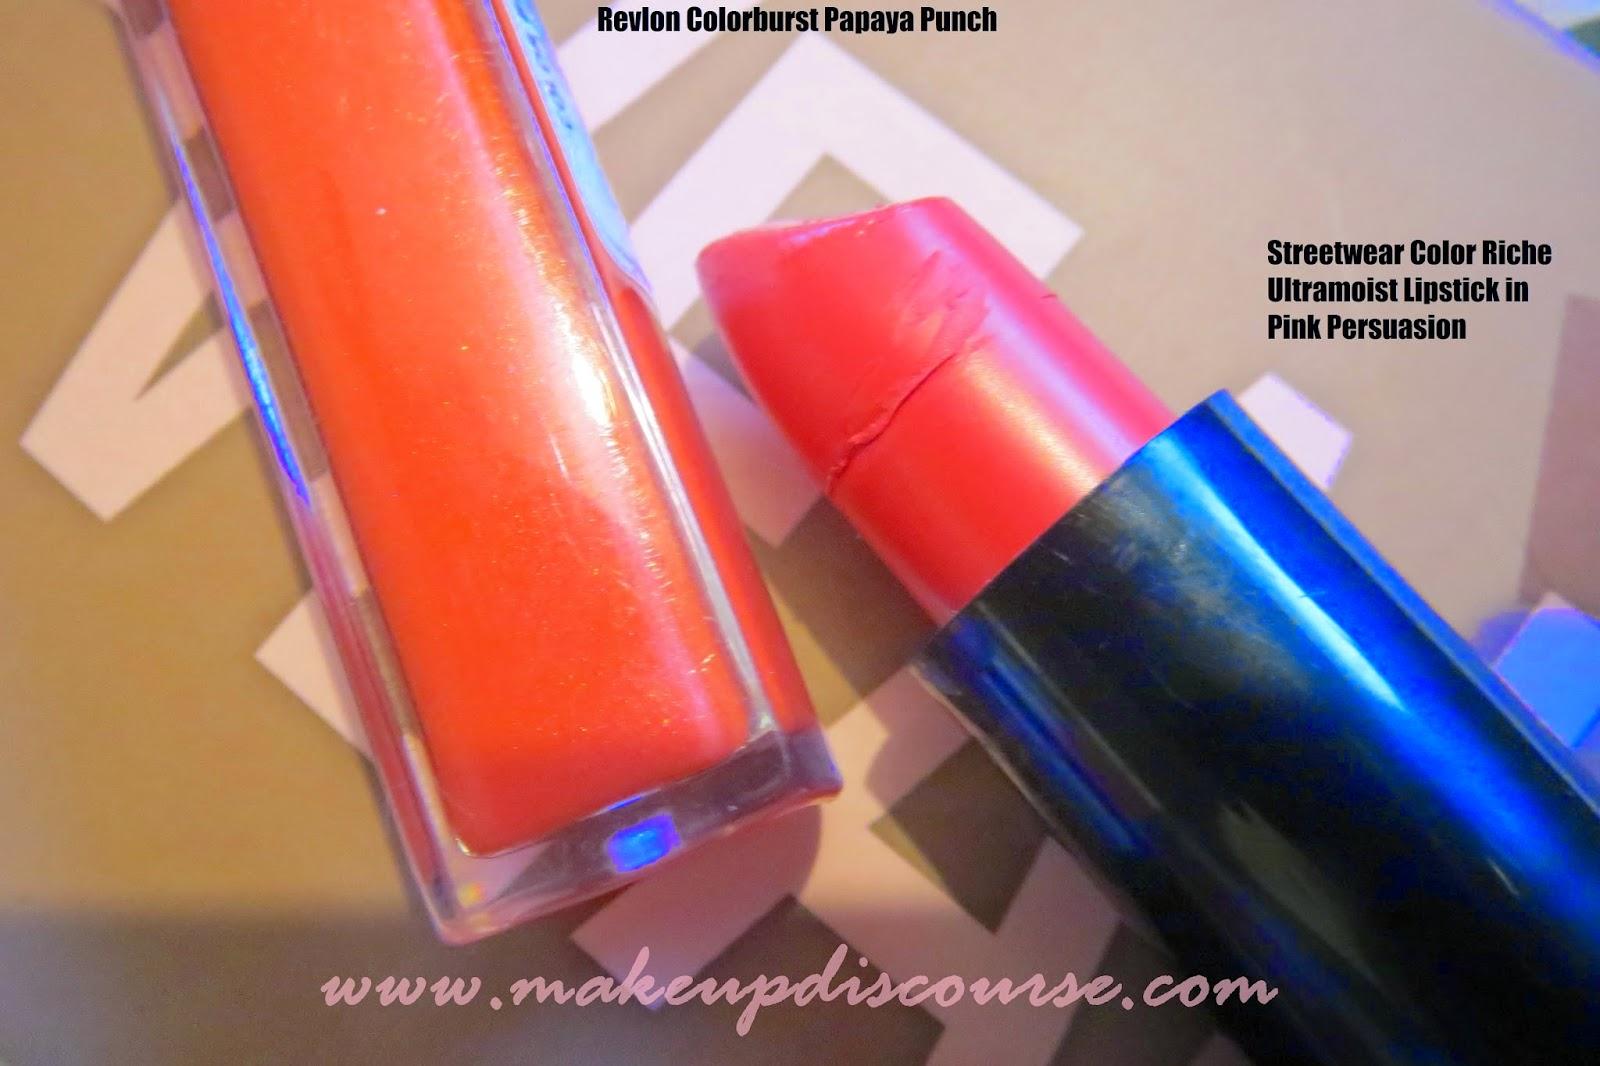 Streetwear Color Rich Ultramoist Lipstick in Pink Persuasion  Revlon Colorburst Lipgloss in Papaya Punch